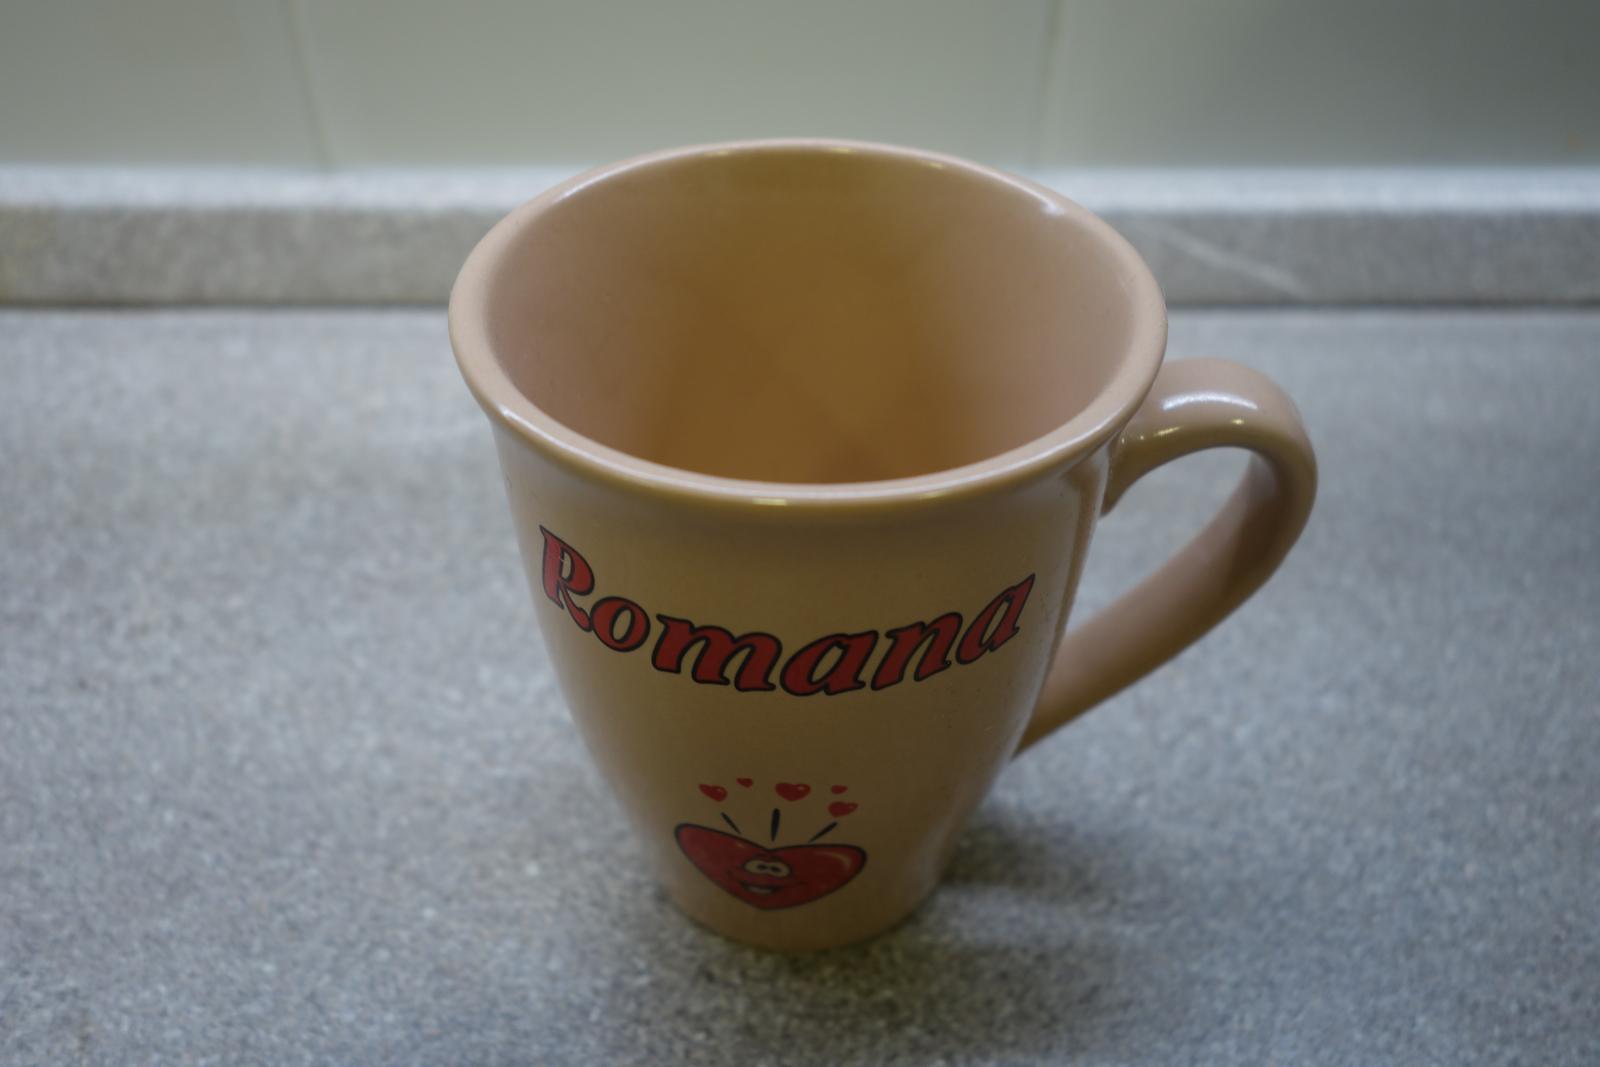 Hrnček Romana - Obrázok č. 2